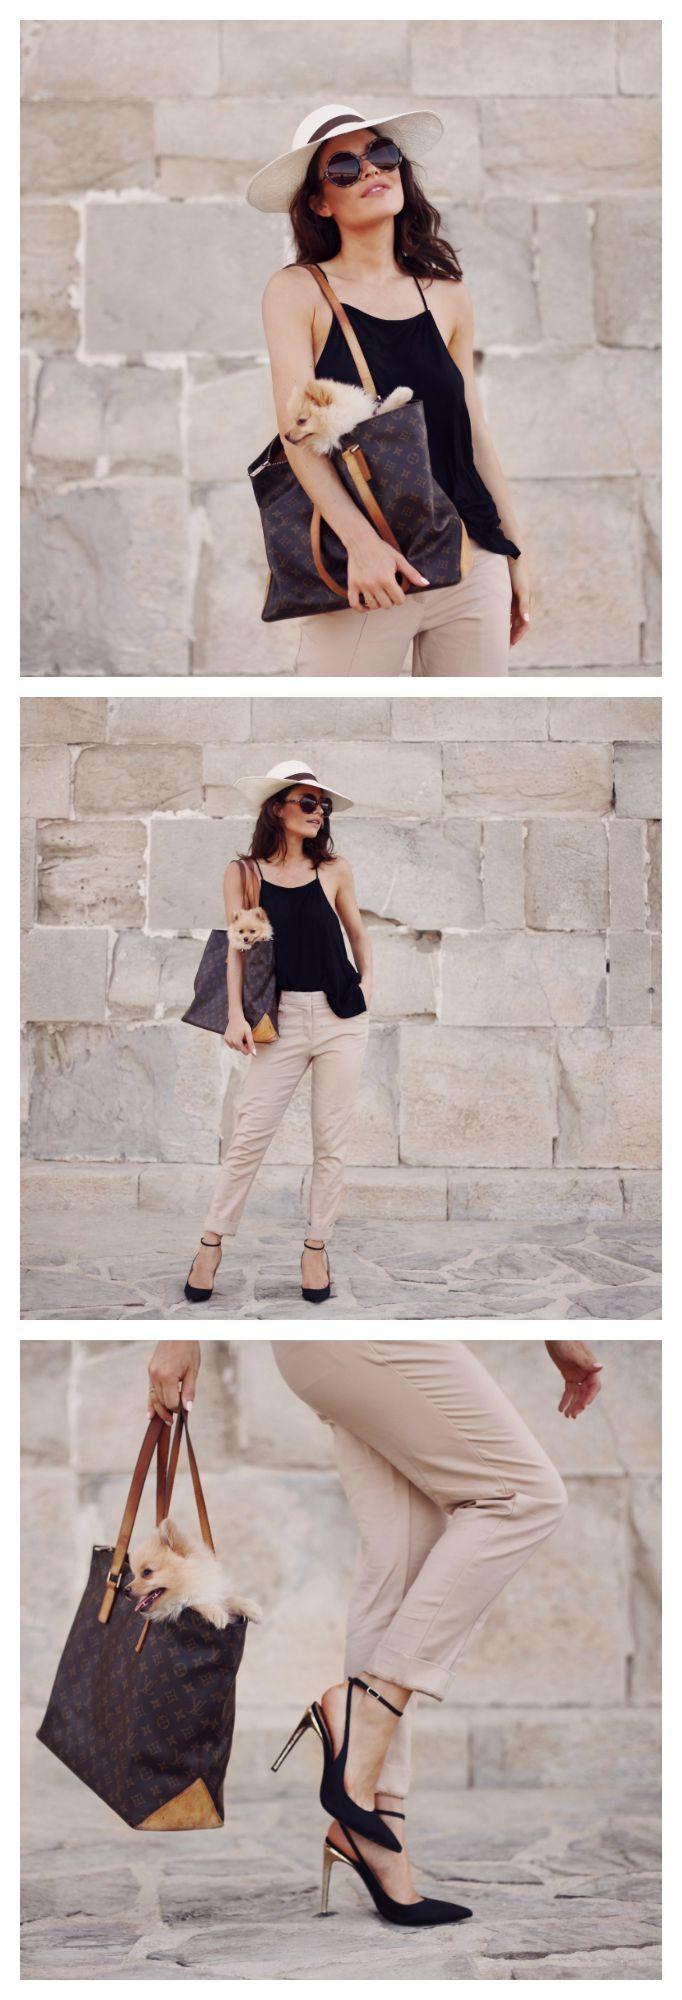 #kallisé shoes - #doria1905 Straw hat and TYG Spectacles sunglasses. Shop now on the store!! www.tieapart.com